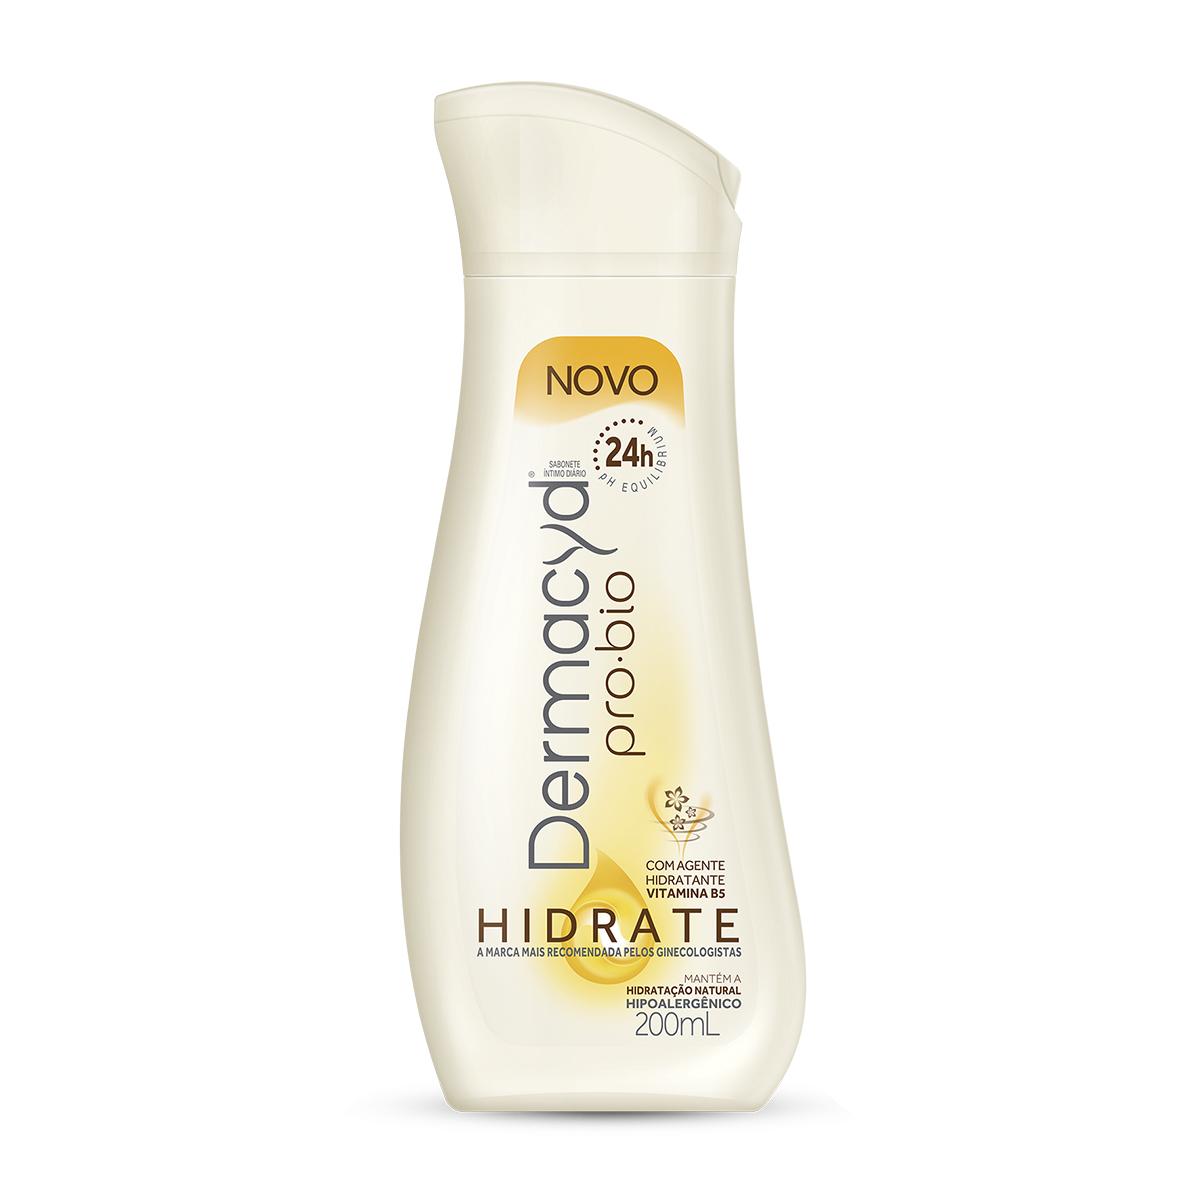 Sabonete Líquido Íntimo Dermacyd Pro-Bio Hidrate com 200ml 200ml